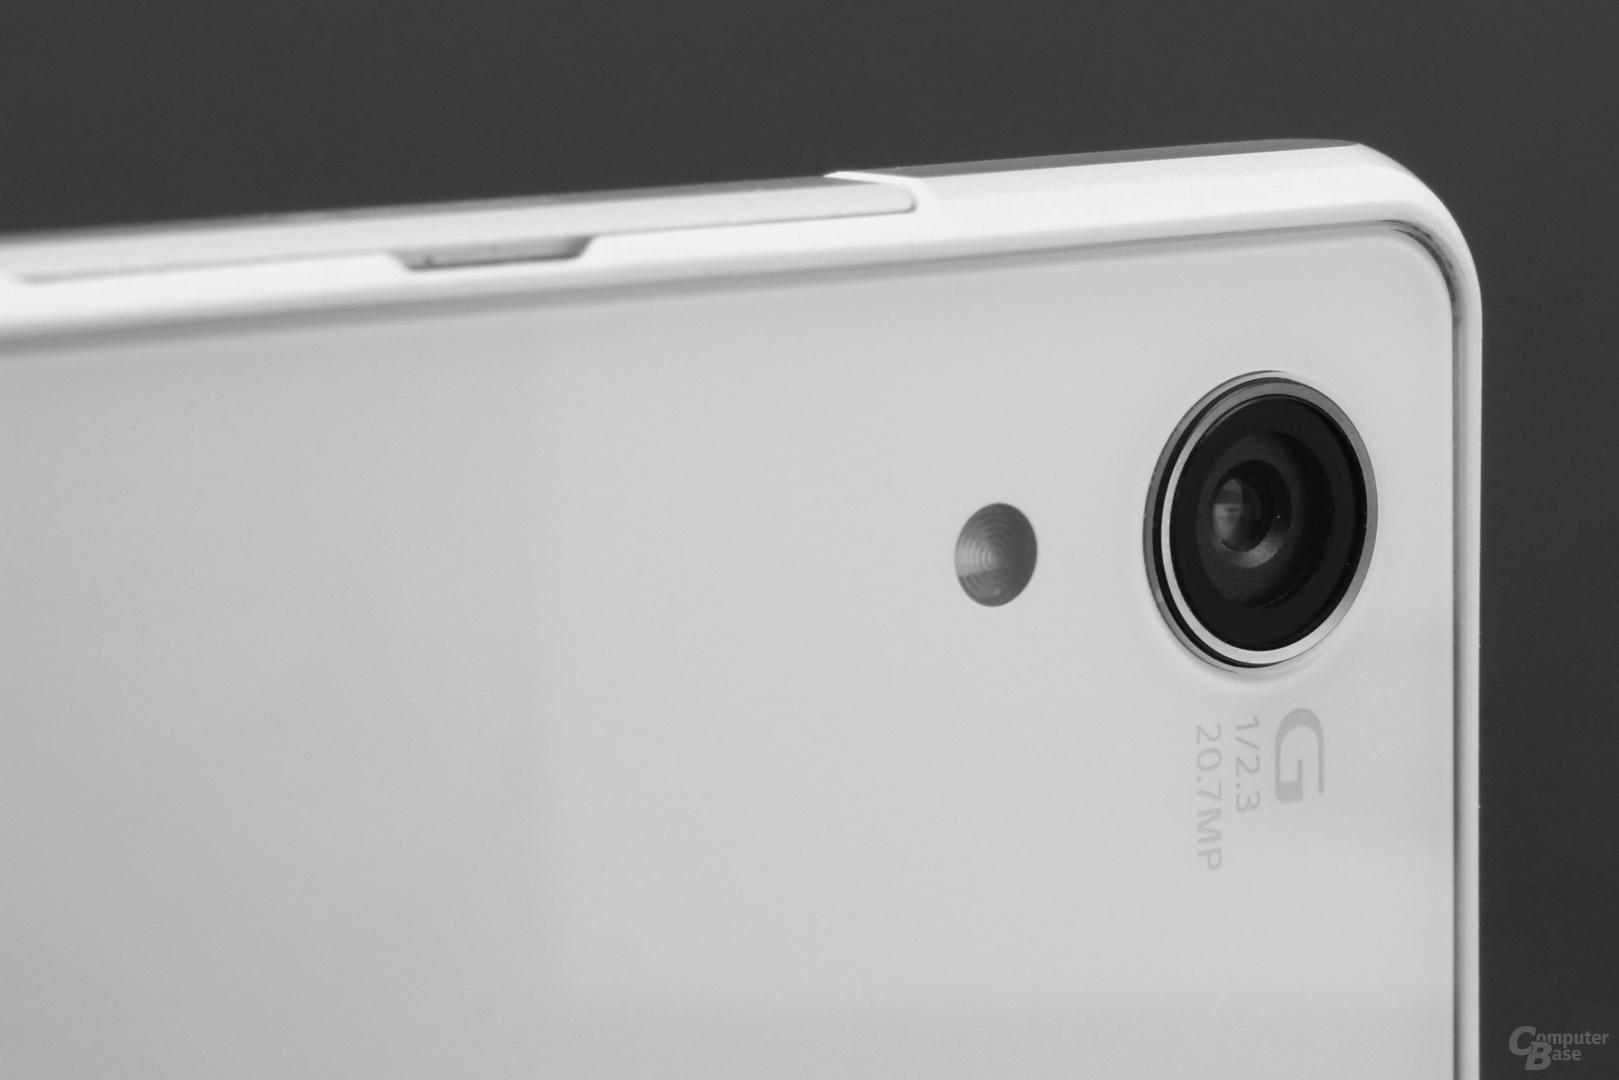 Kamera mit 20,7 Megapixeln, LED-Blitz, f/2,0-Blende und UHD-Video